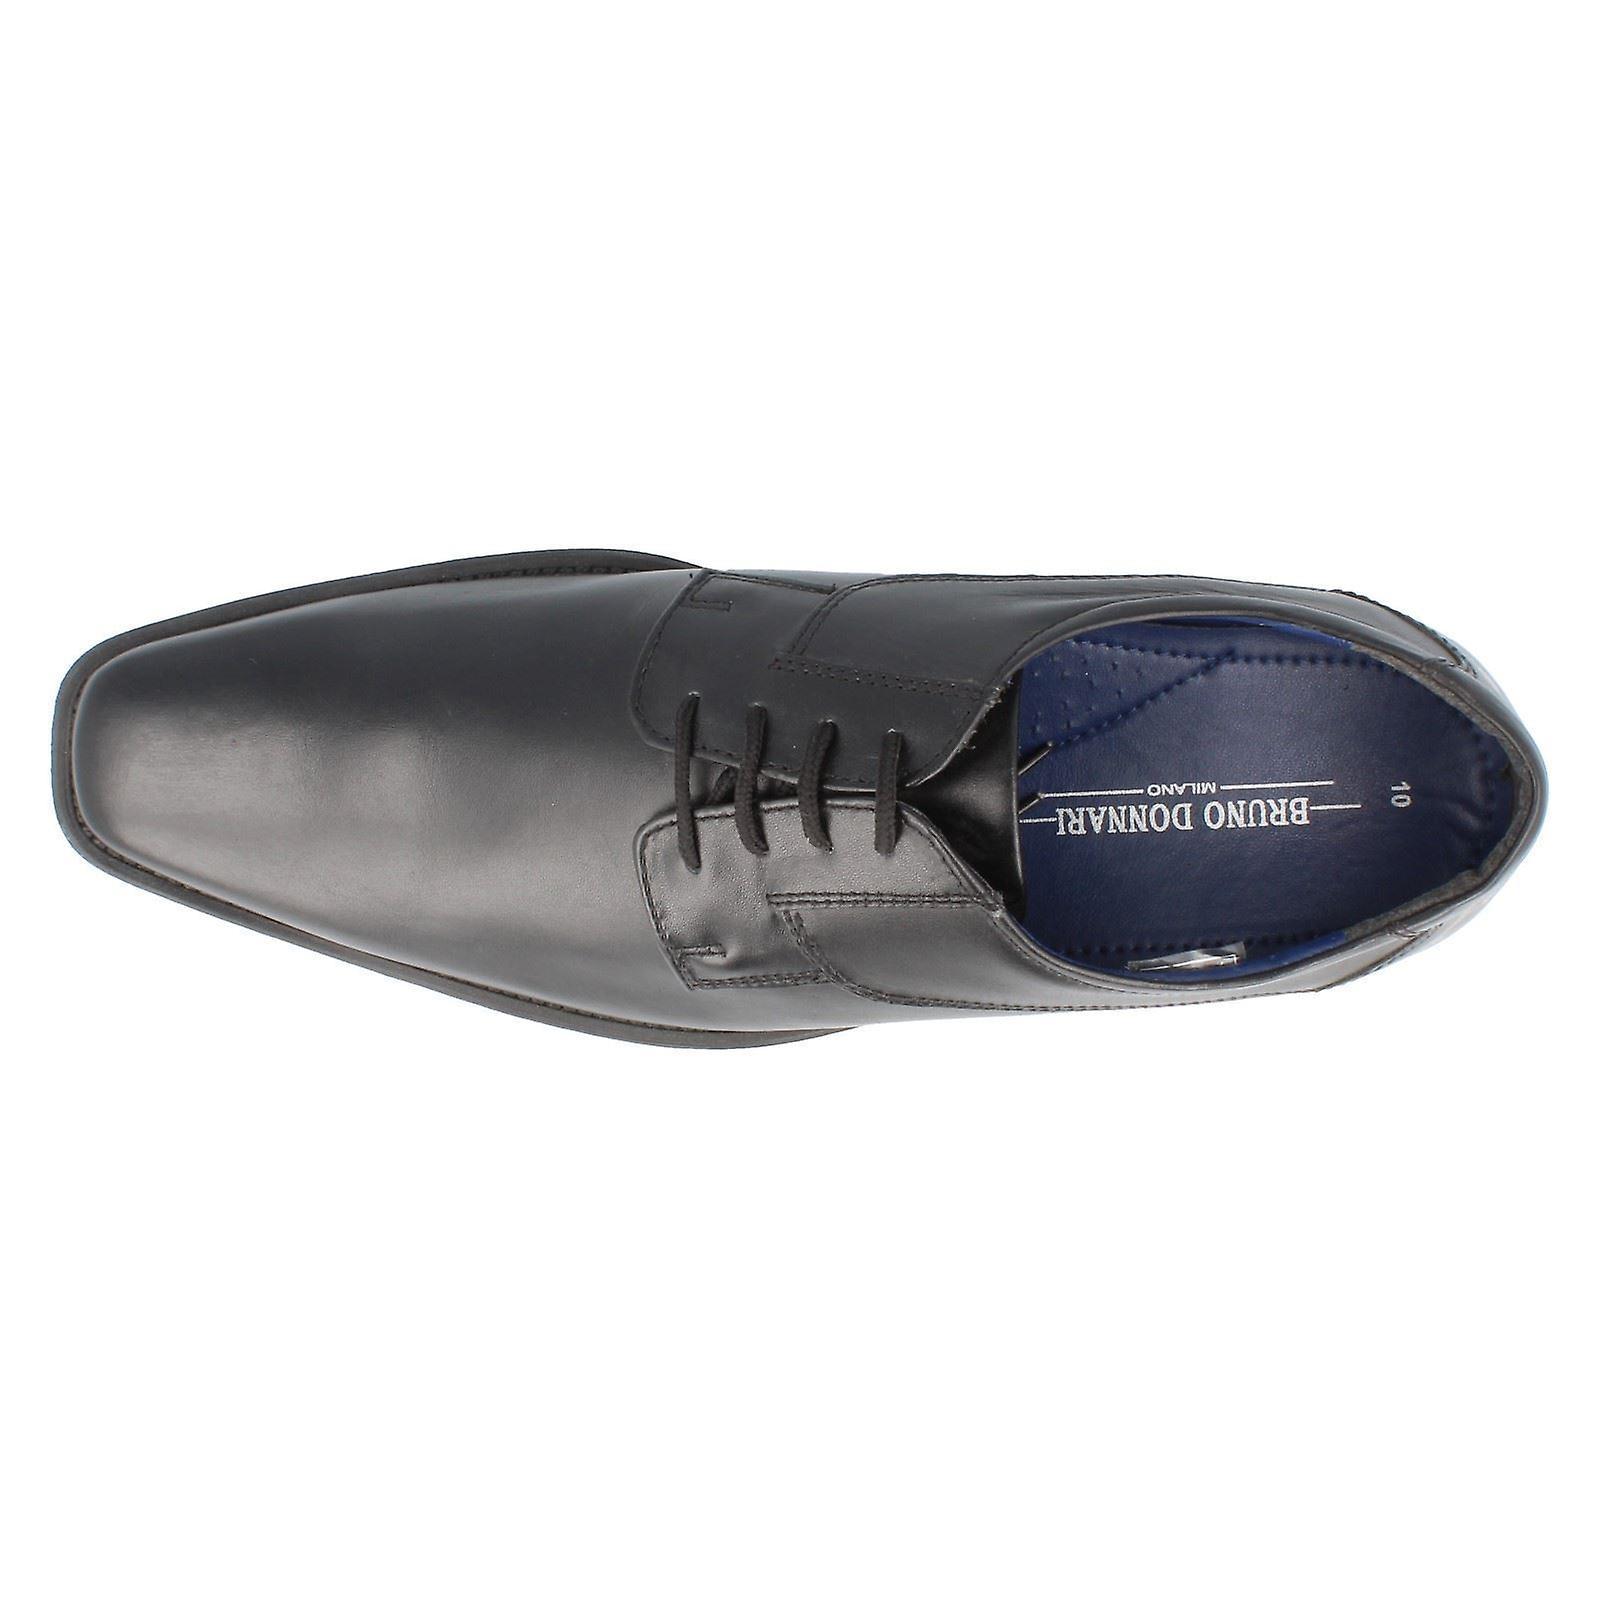 Mens Bruno Donnari Smart Lace Up Shoes NN 905 TeGGK3